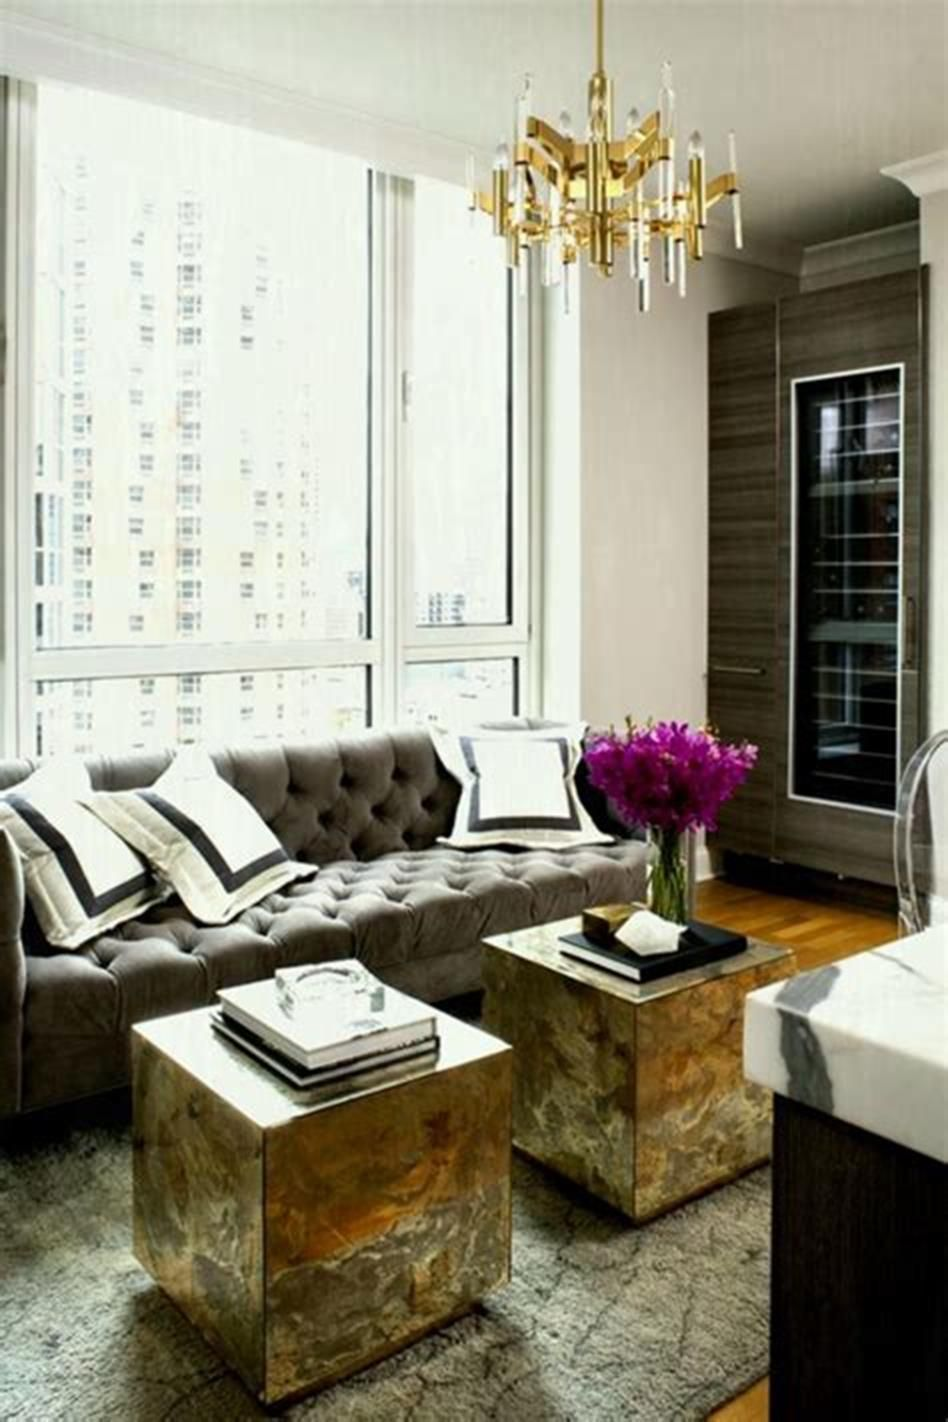 45 Simple Living Room Decorating Ideas On A Budget 2019 Comedecor Elegant Living Room Design Glamour Living Room Bedroom Design Styles